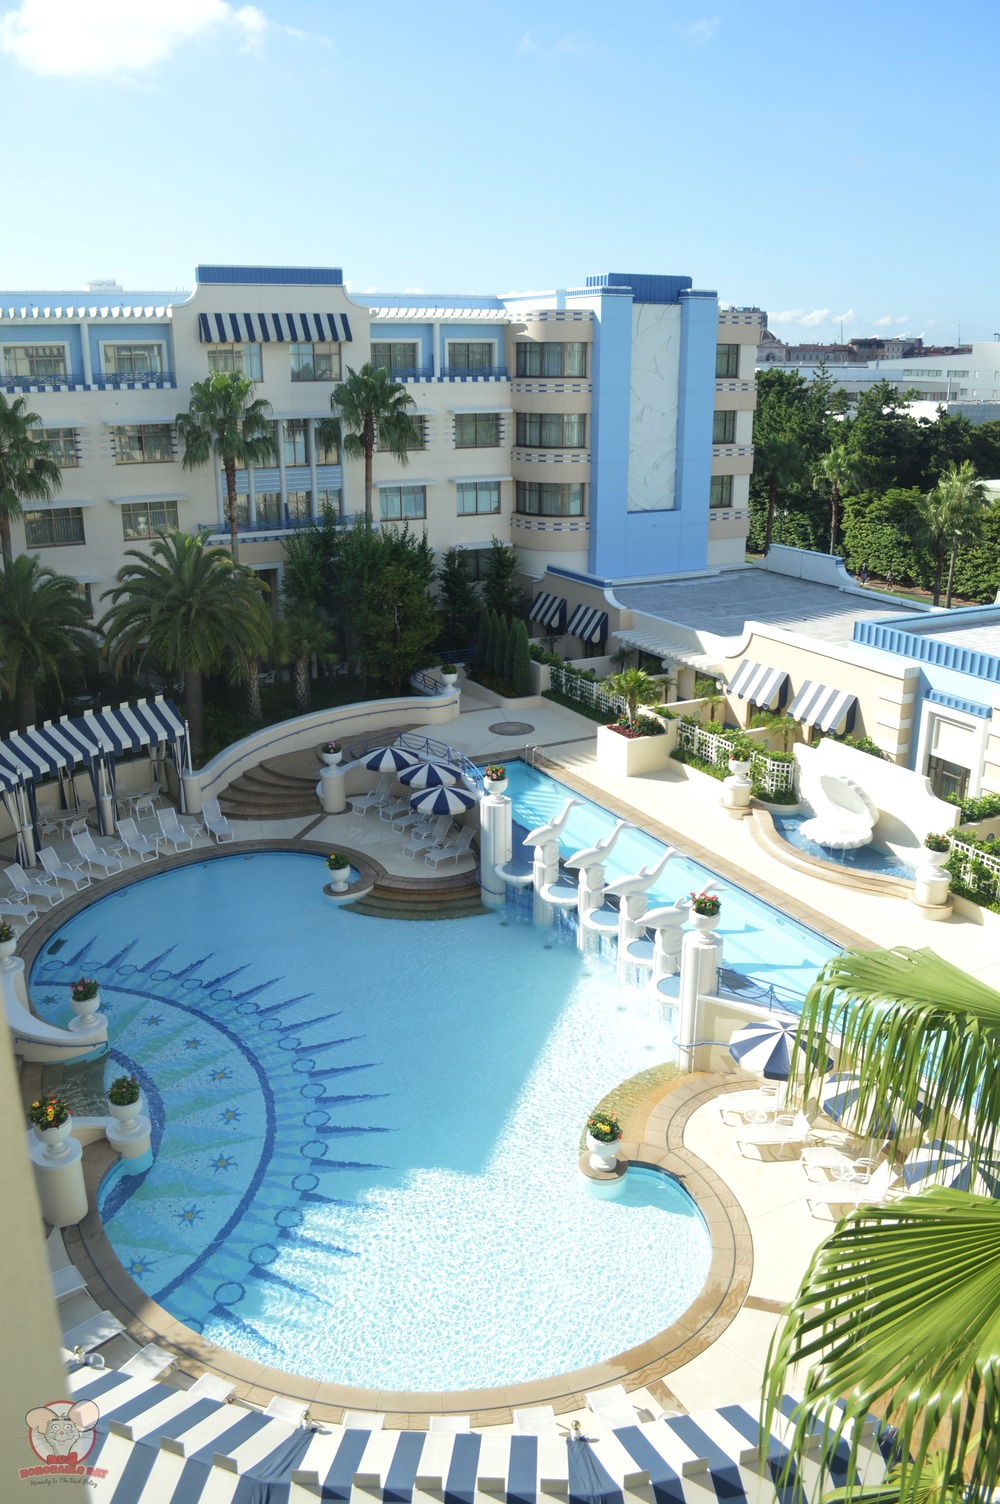 Ambassador Hotel's pool